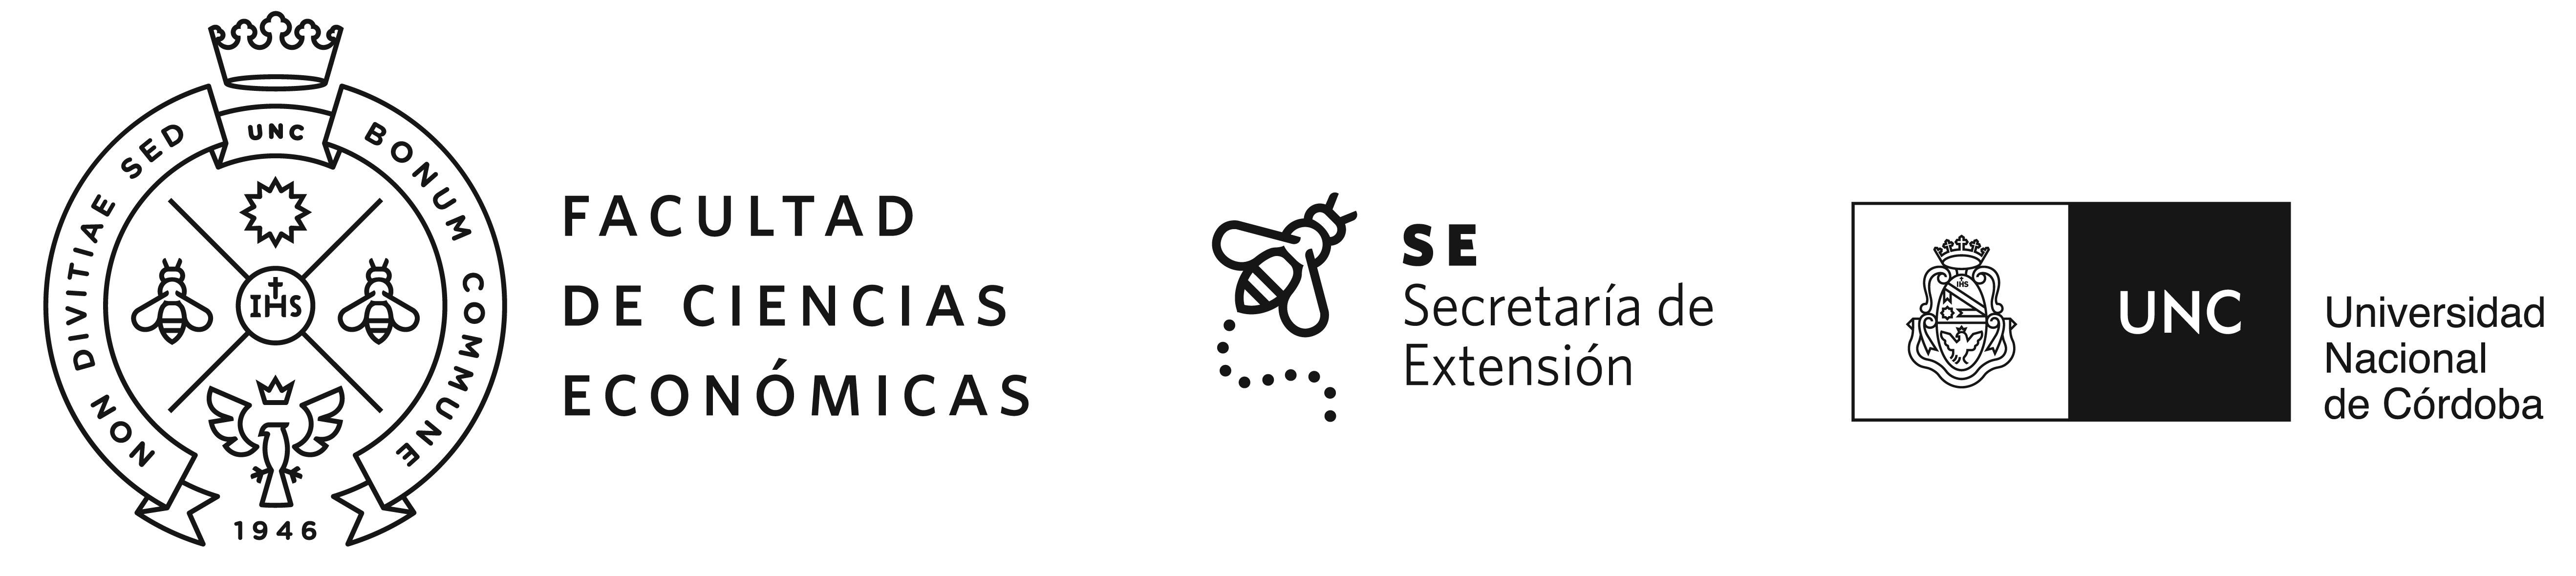 Logo SE FCE UNC